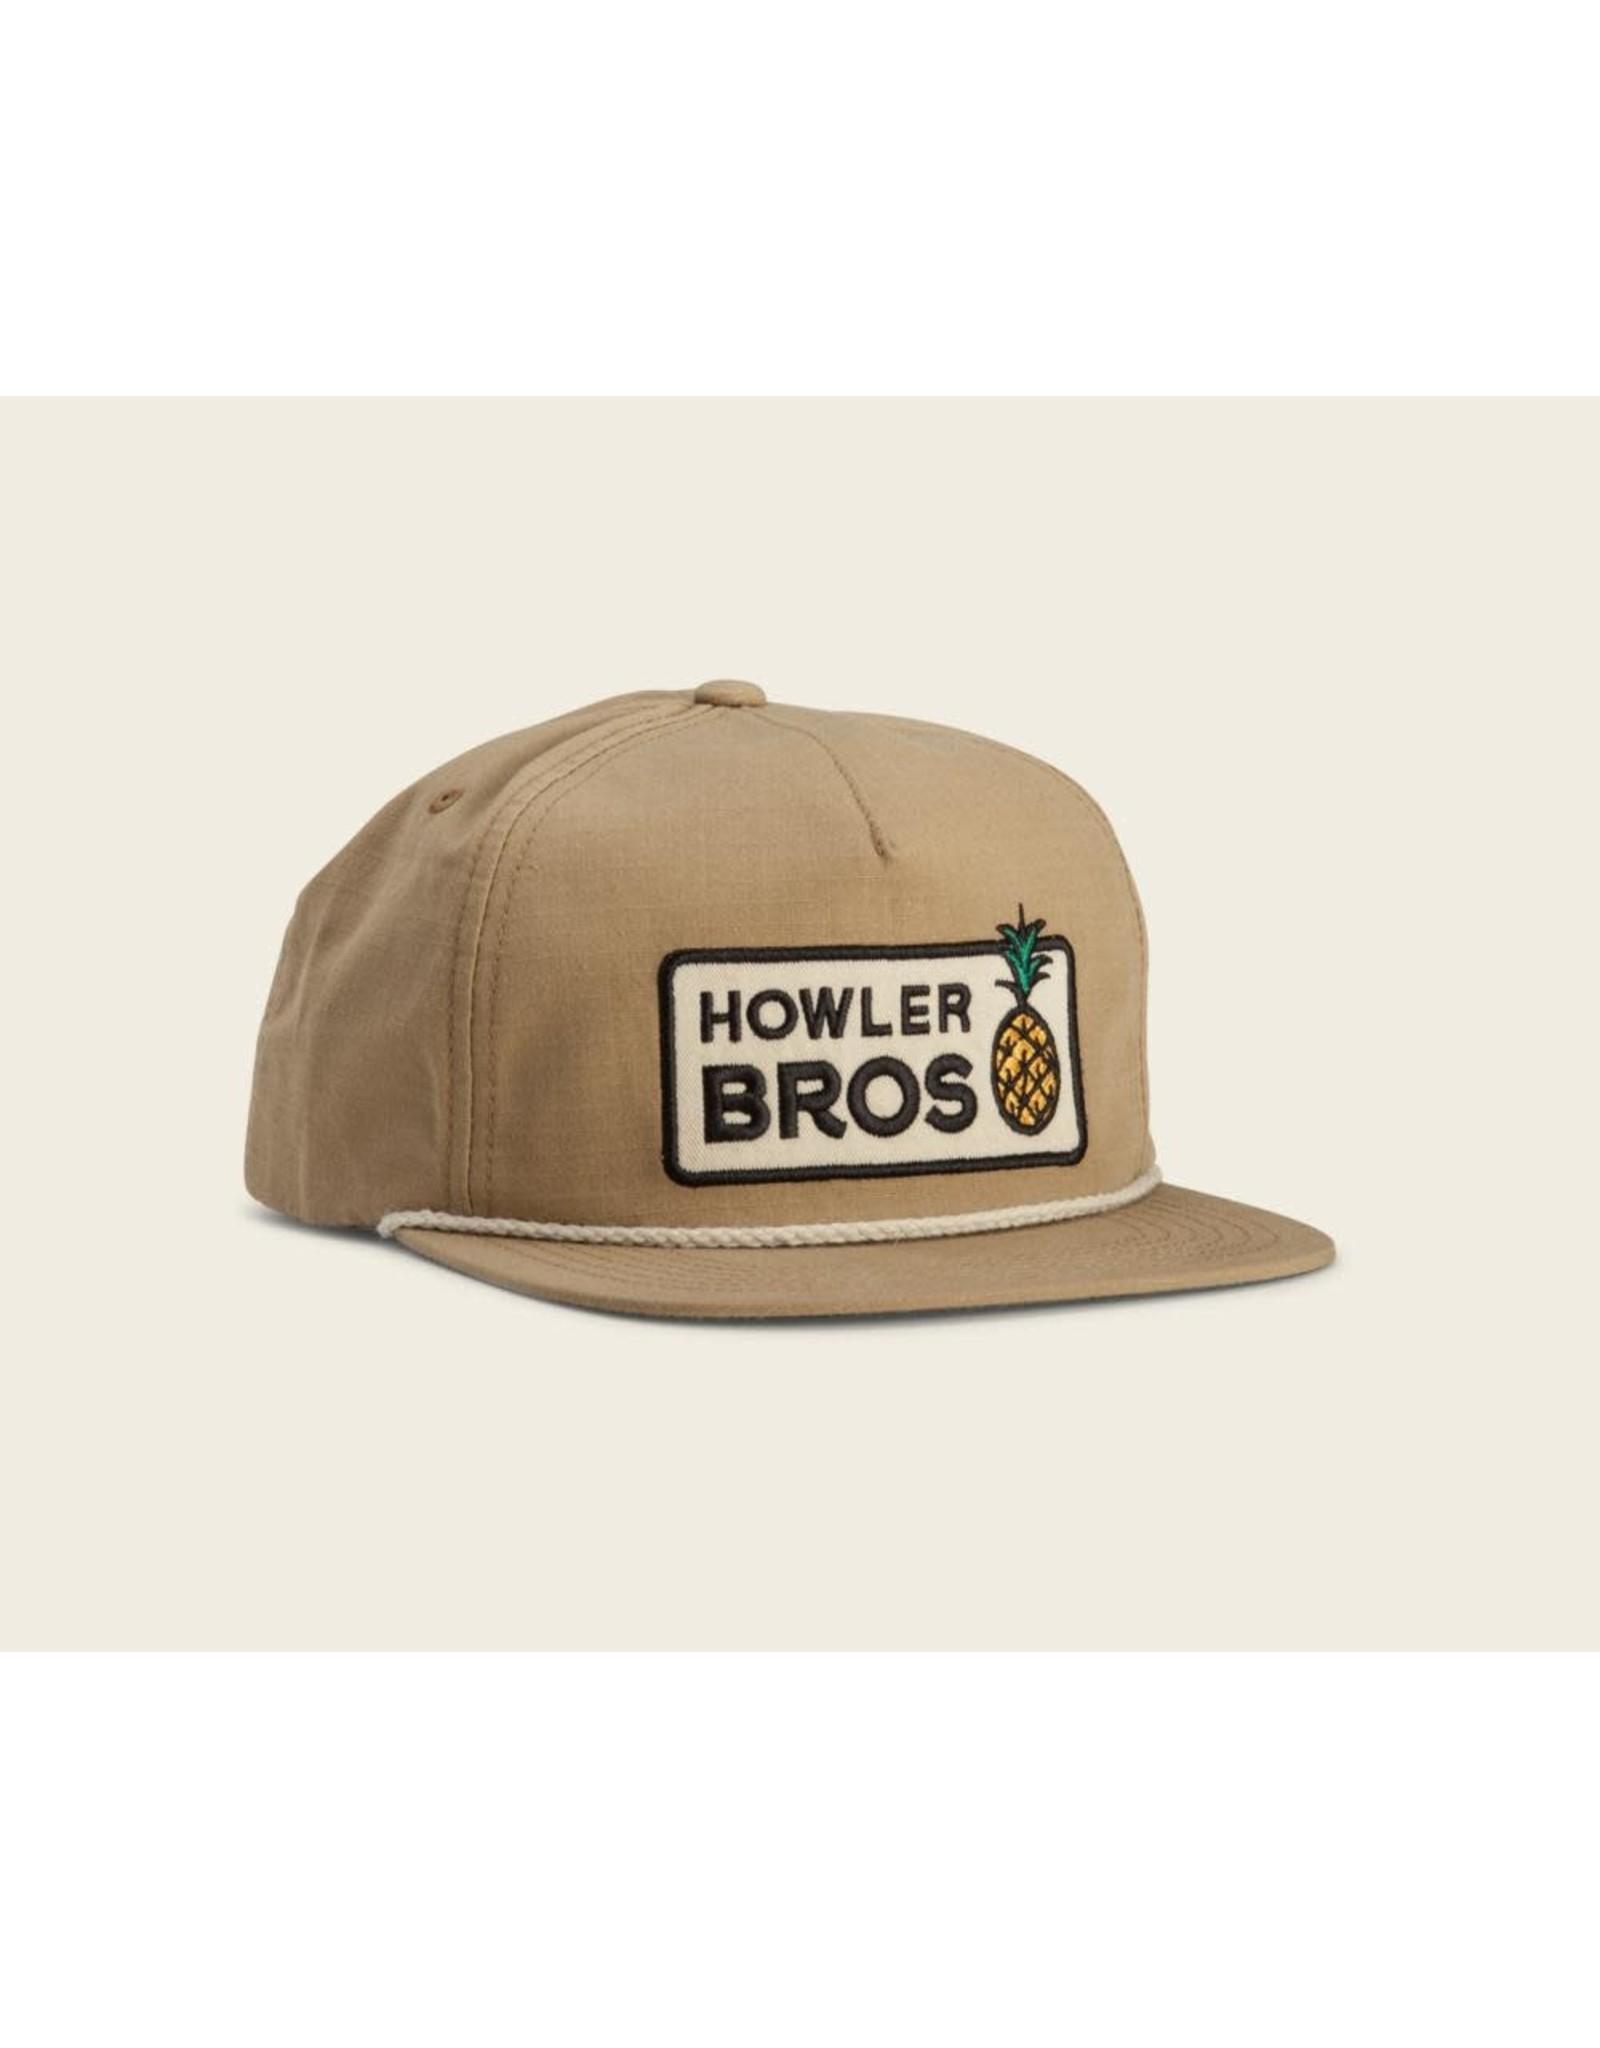 Howler Bros HB Hospitality Snapback Hat- British Khaki